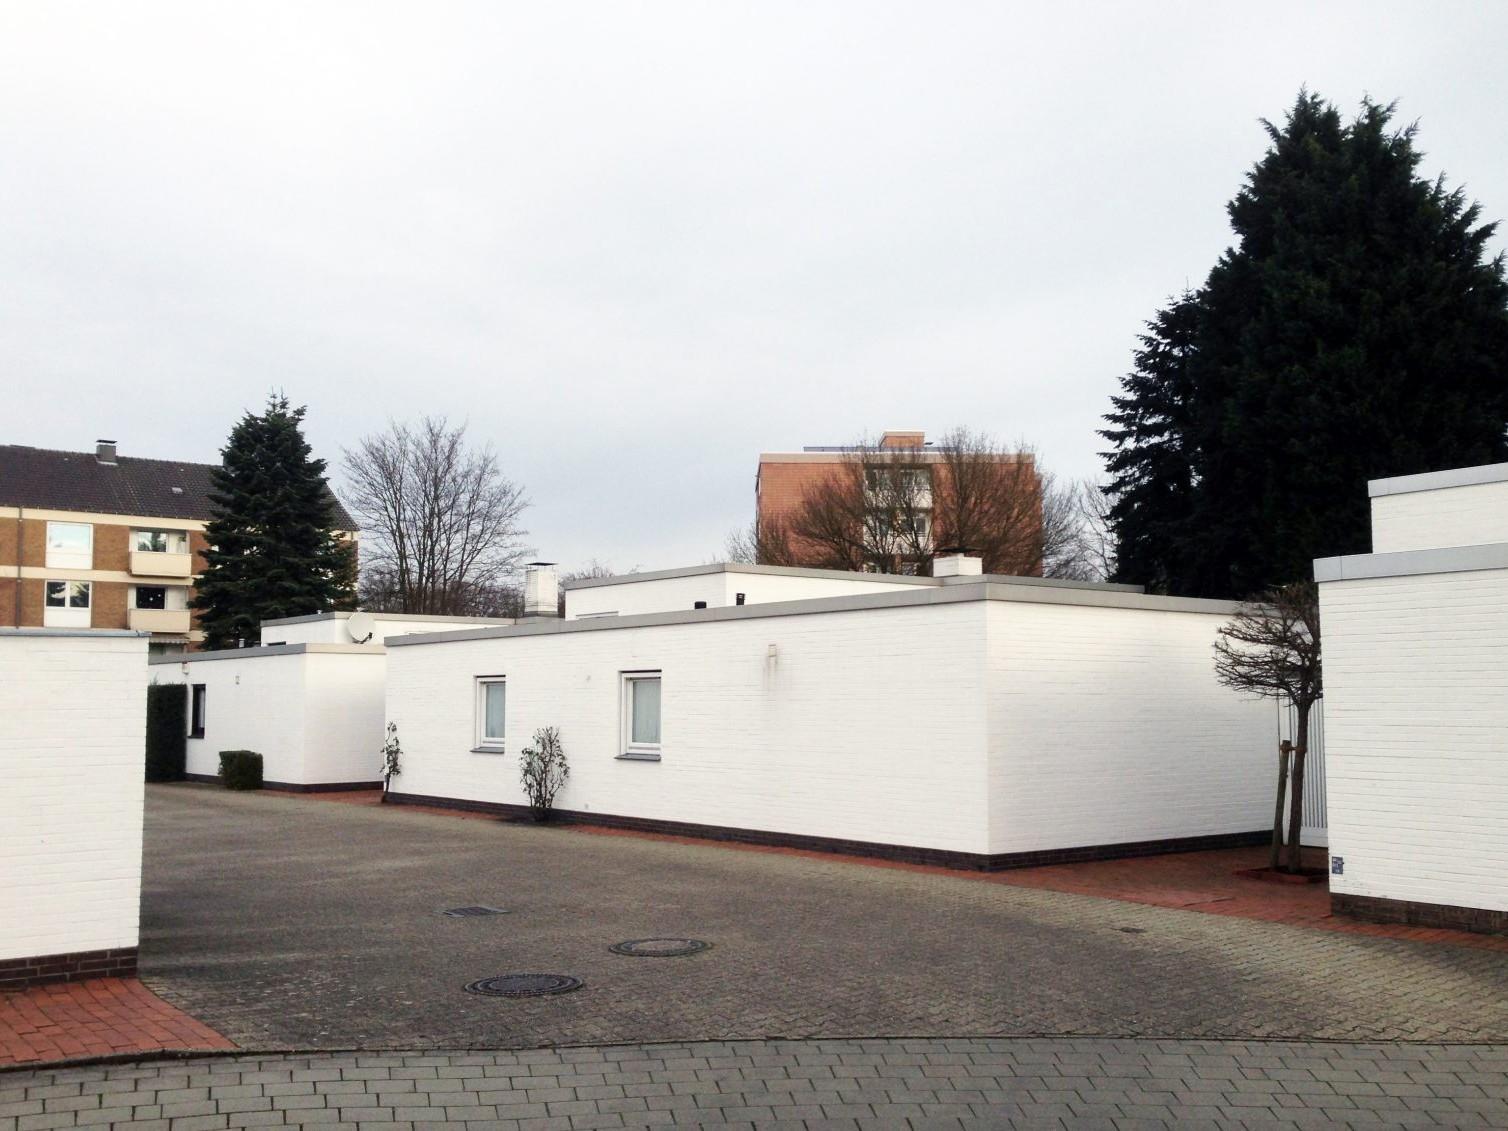 Münster vor Ort: Görlitzer Straße, Coerde - Foto: Stefan Rethfeld